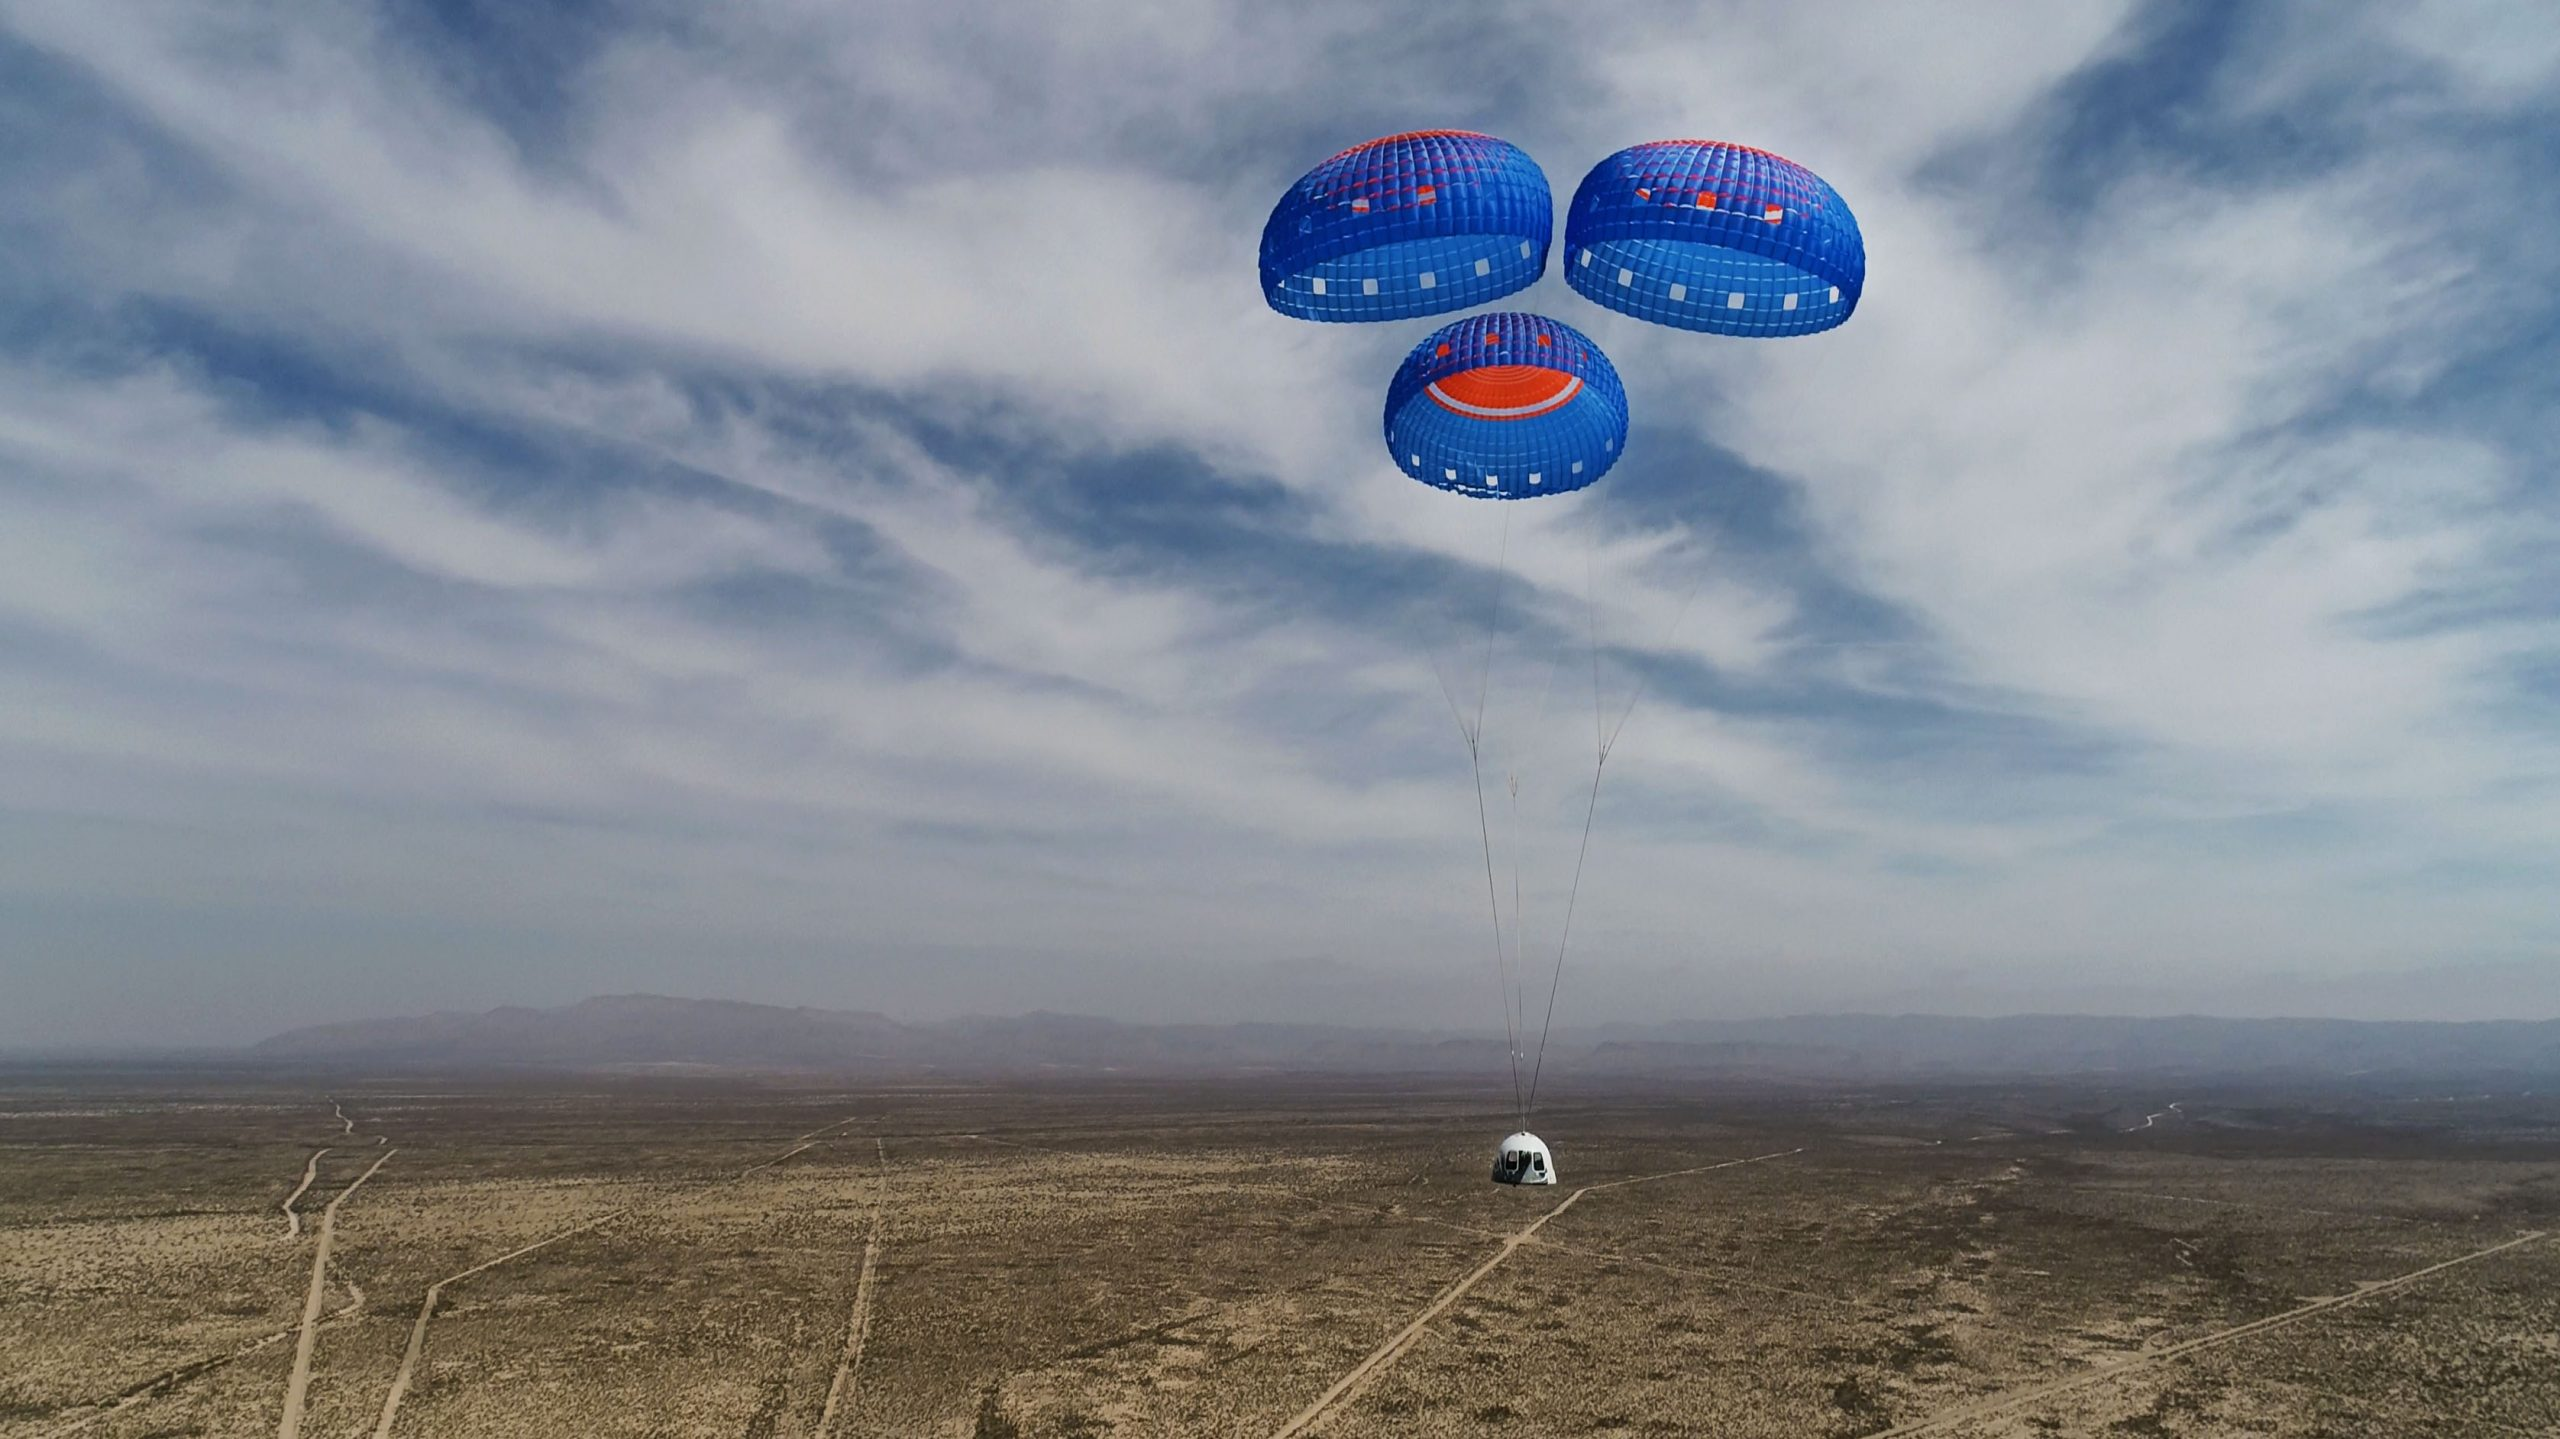 O  Τζεφ Μπέζος σε ένα μαγικό ταξίδι 10 λεπτών στο διάστημα (video)